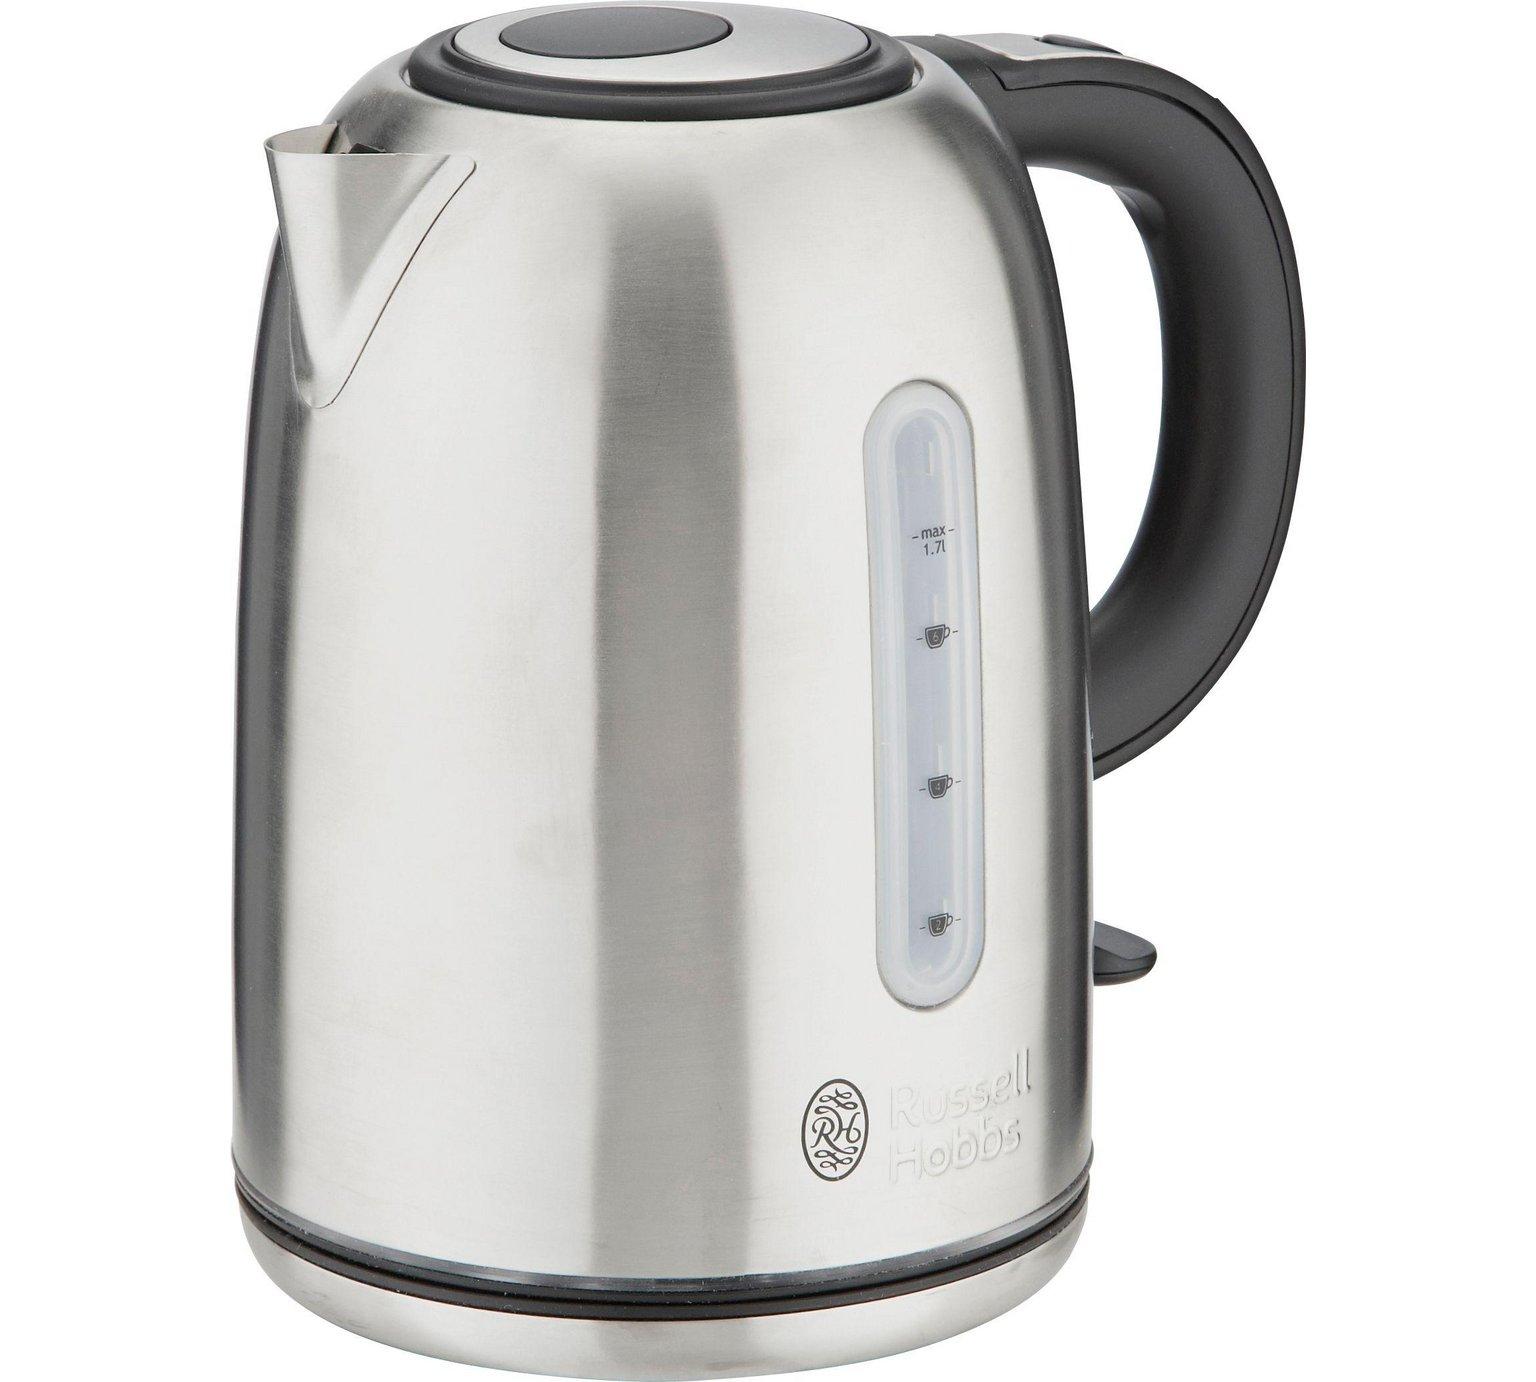 russell hobbs 20460 buckingham kettle stainless steel. Black Bedroom Furniture Sets. Home Design Ideas